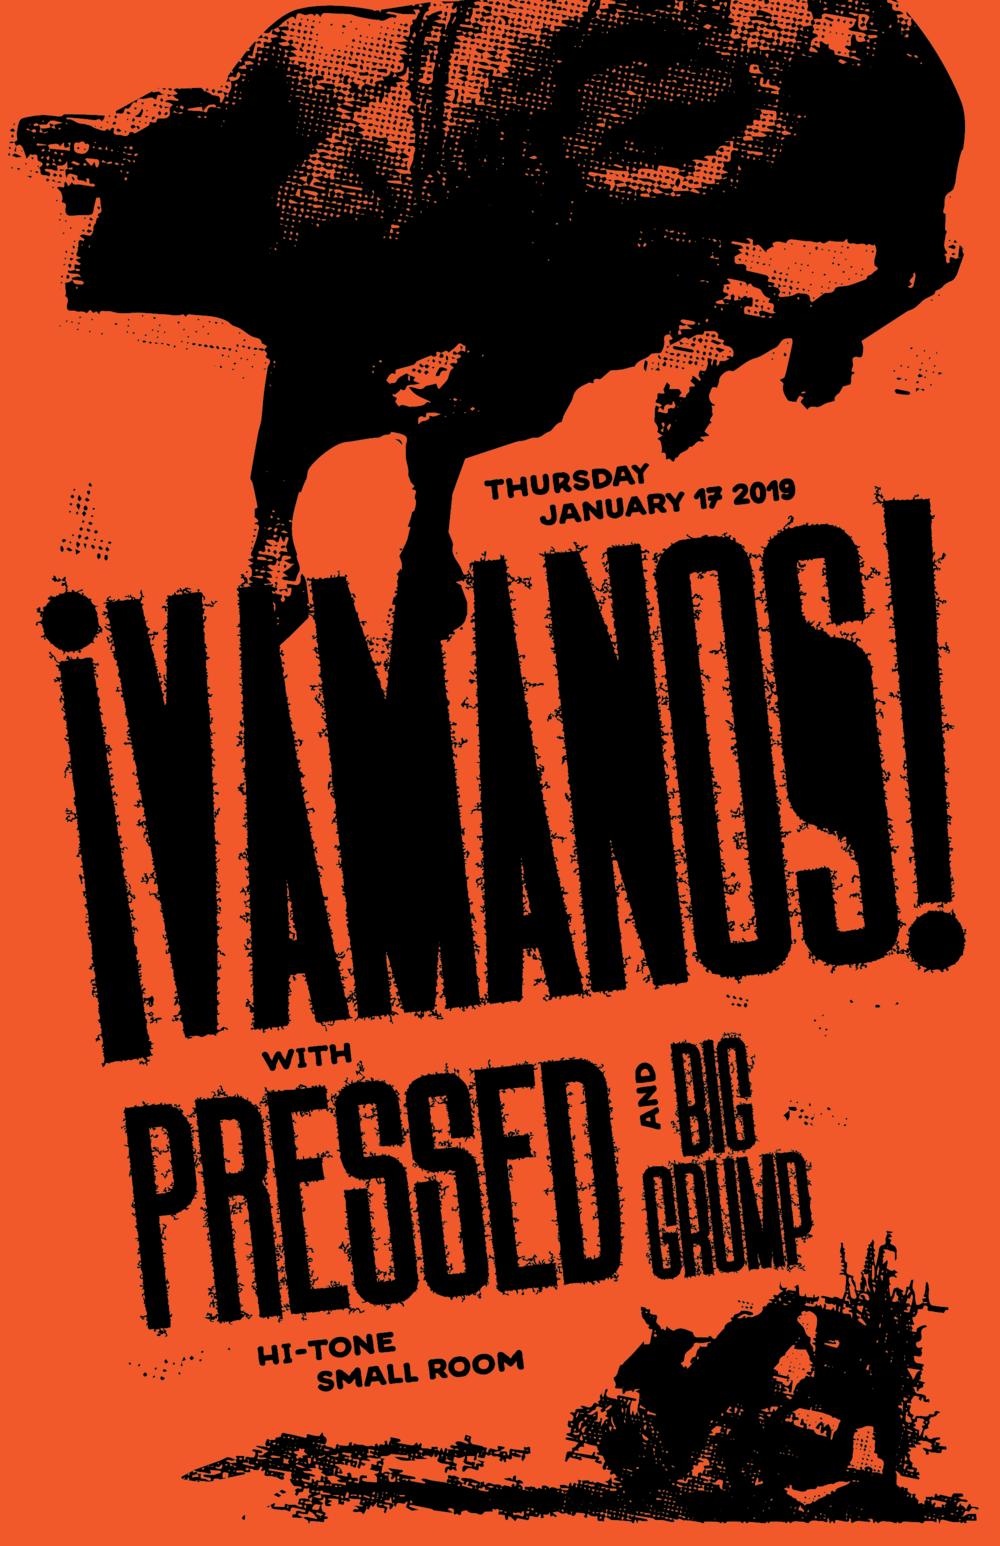 ¡VAMANOS! with Pressed & Grump